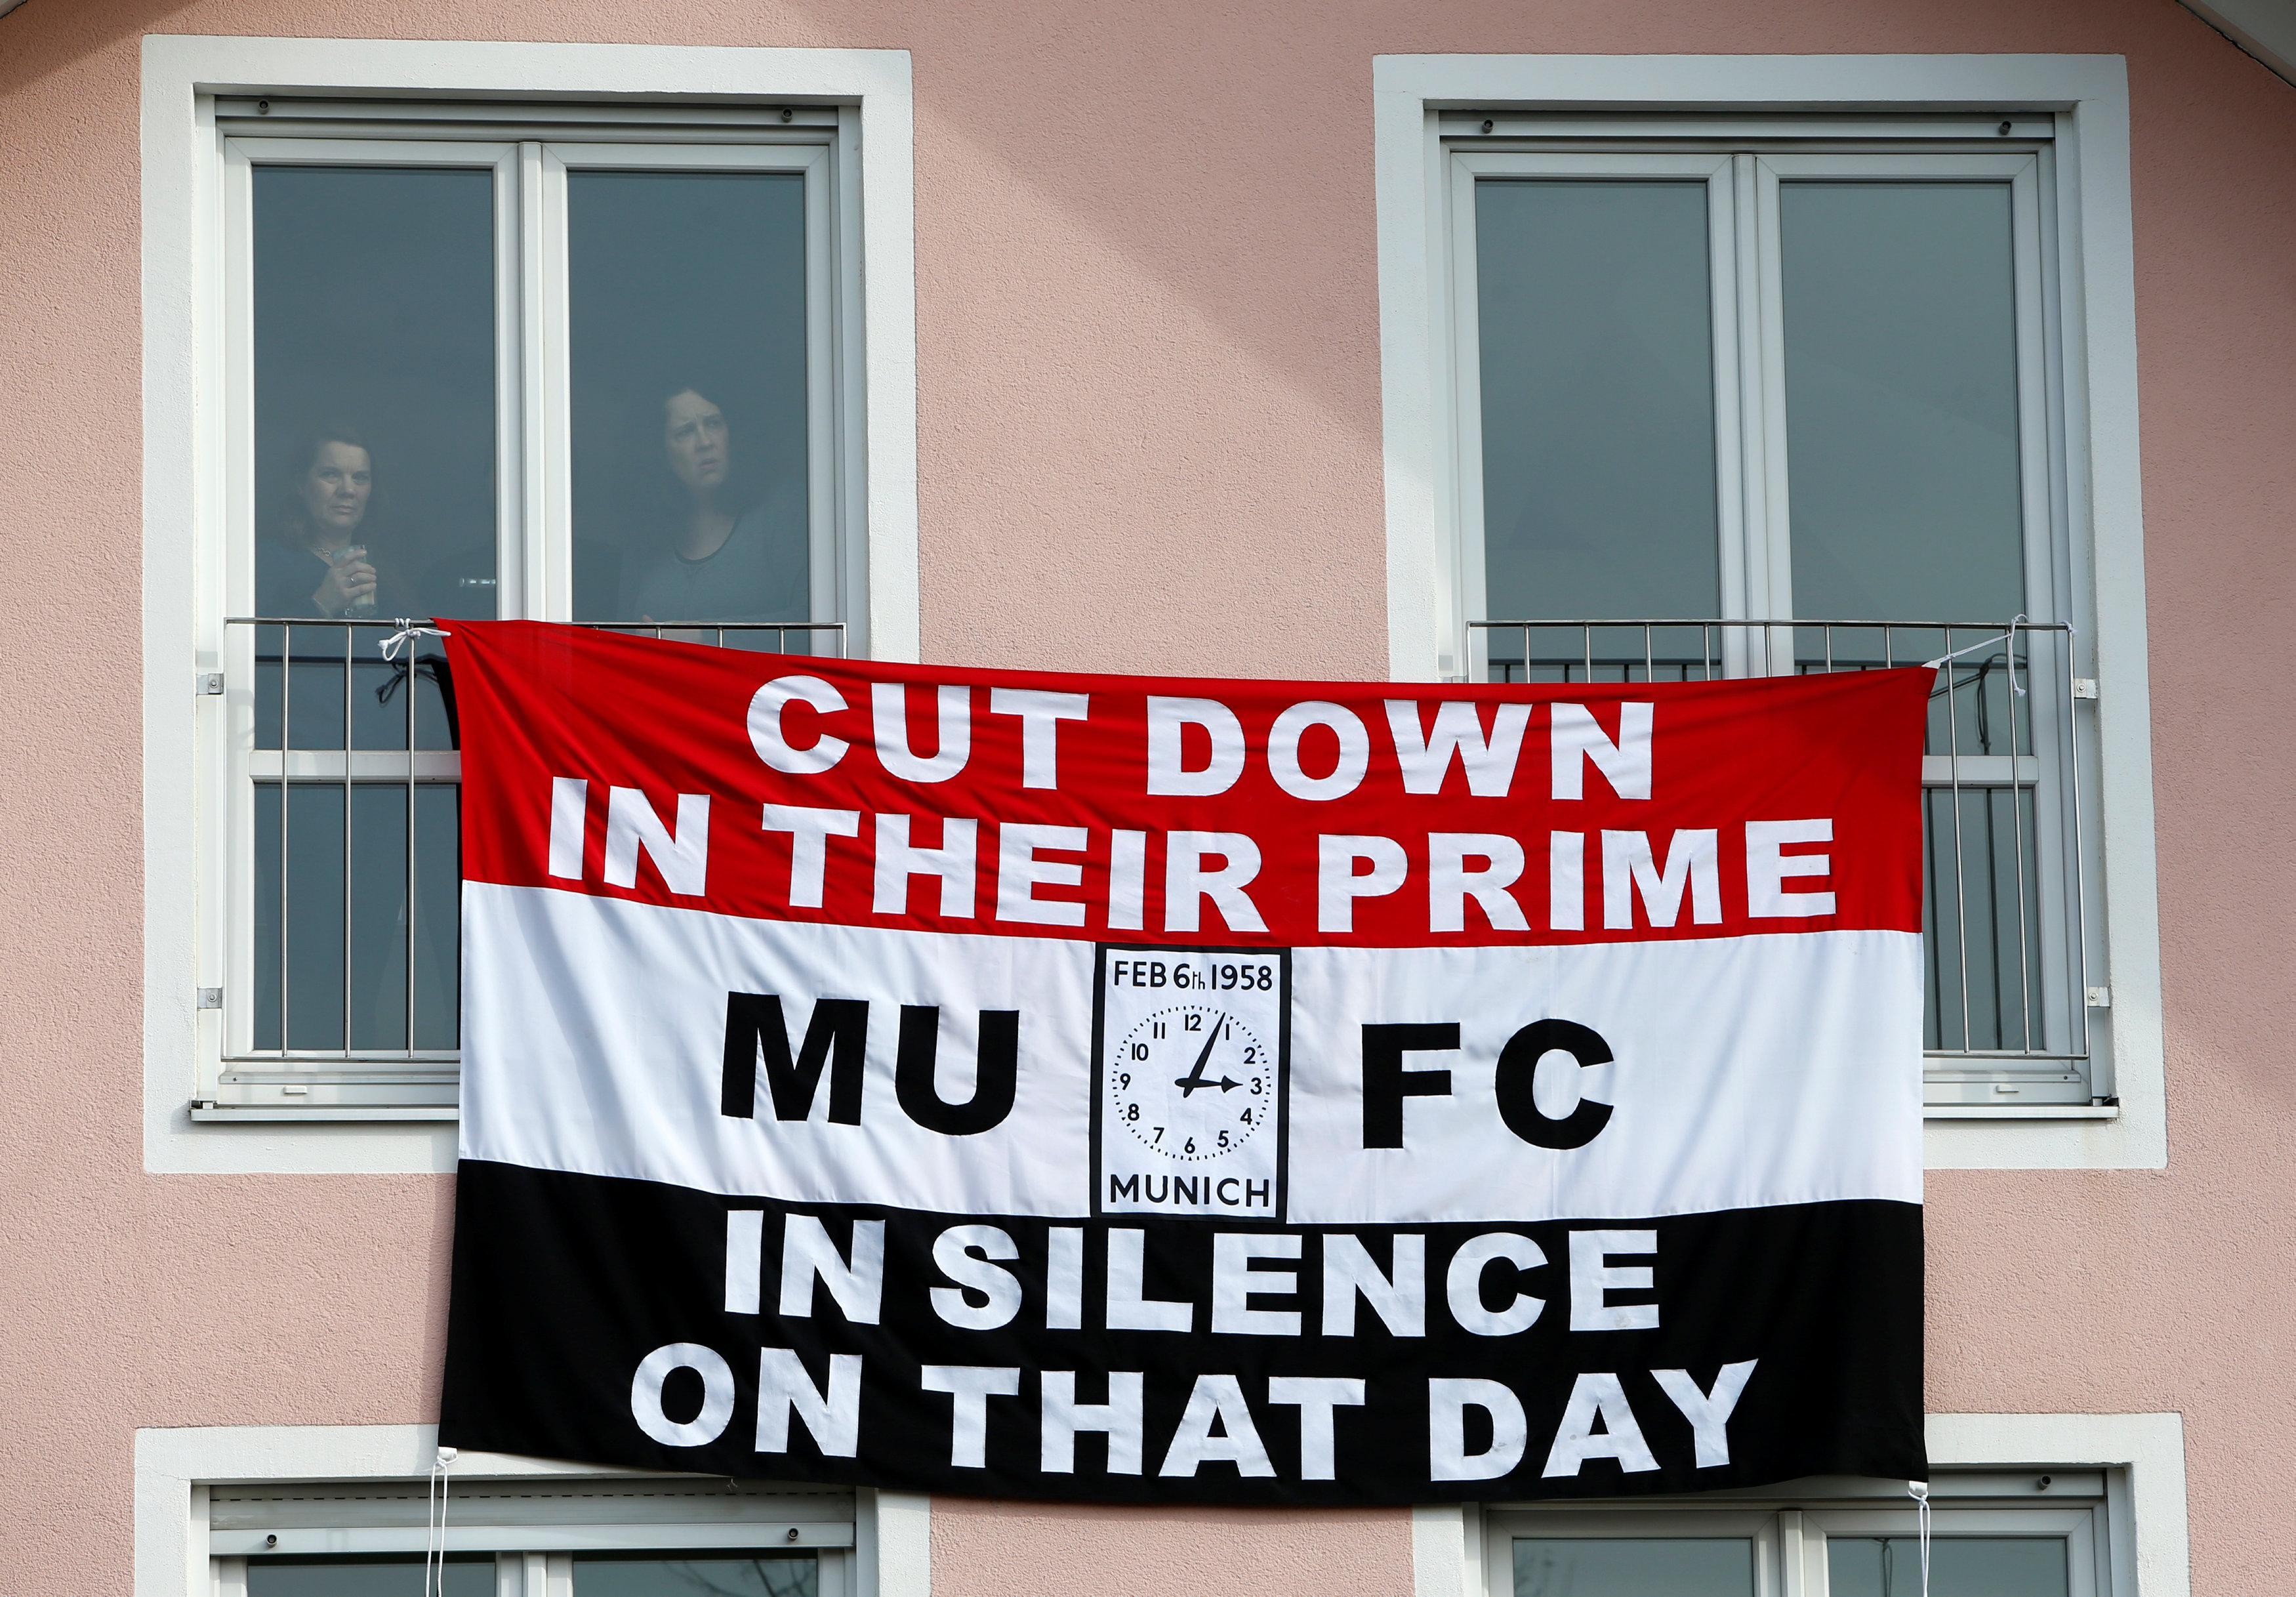 United fans have erected a banner at Manchesterplatz in Munich